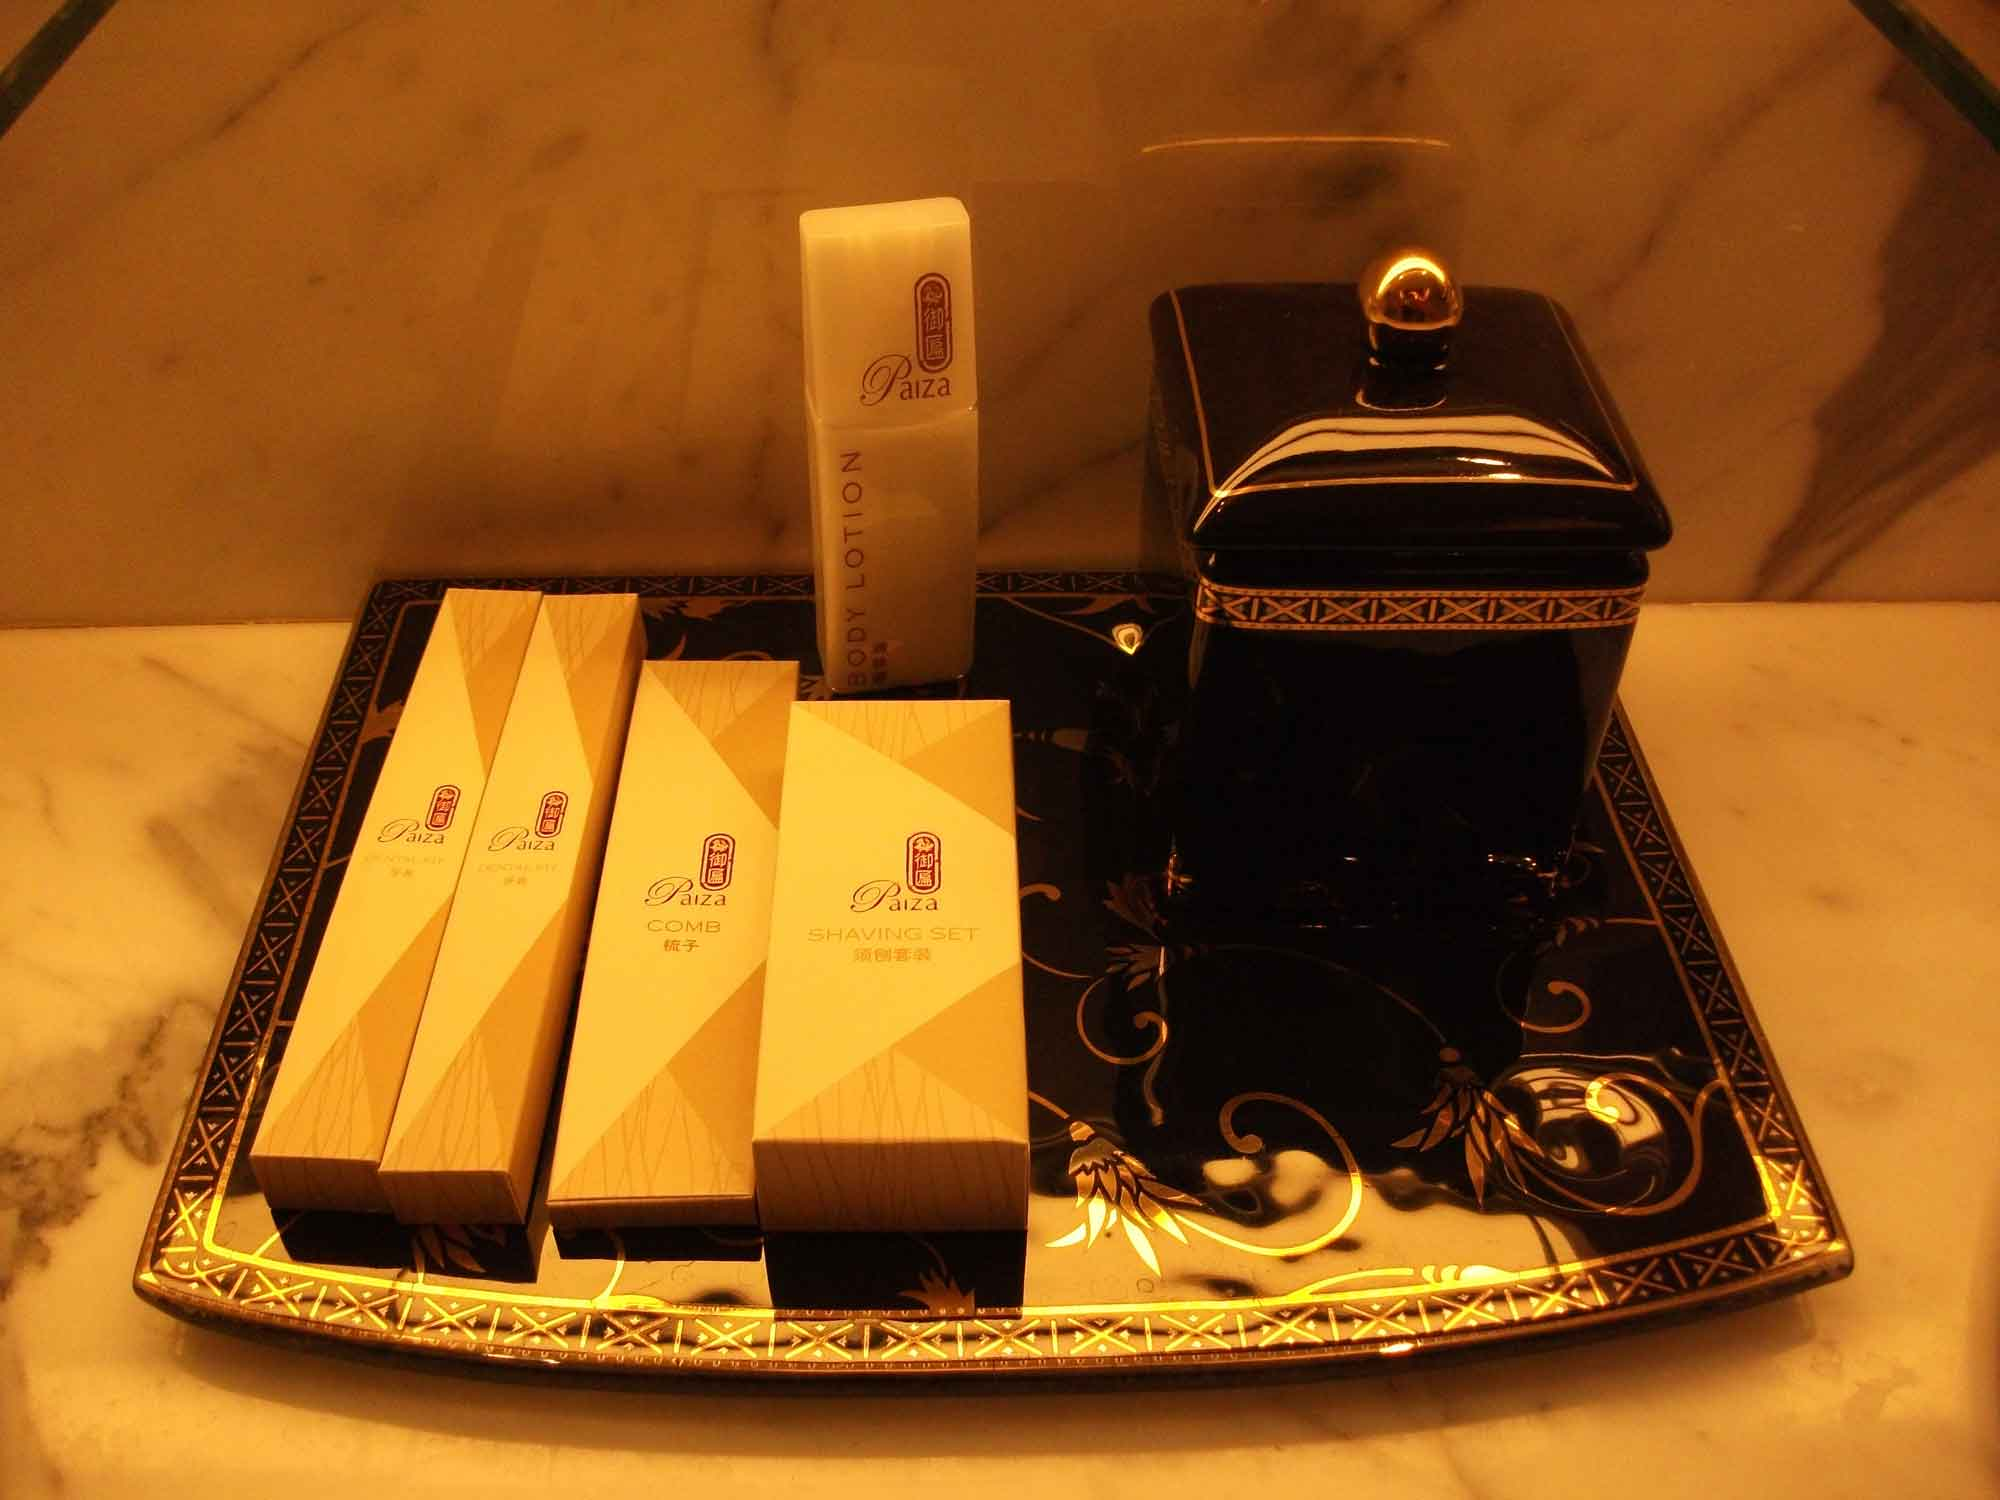 Sands Macao Deluxe Suite toiletries